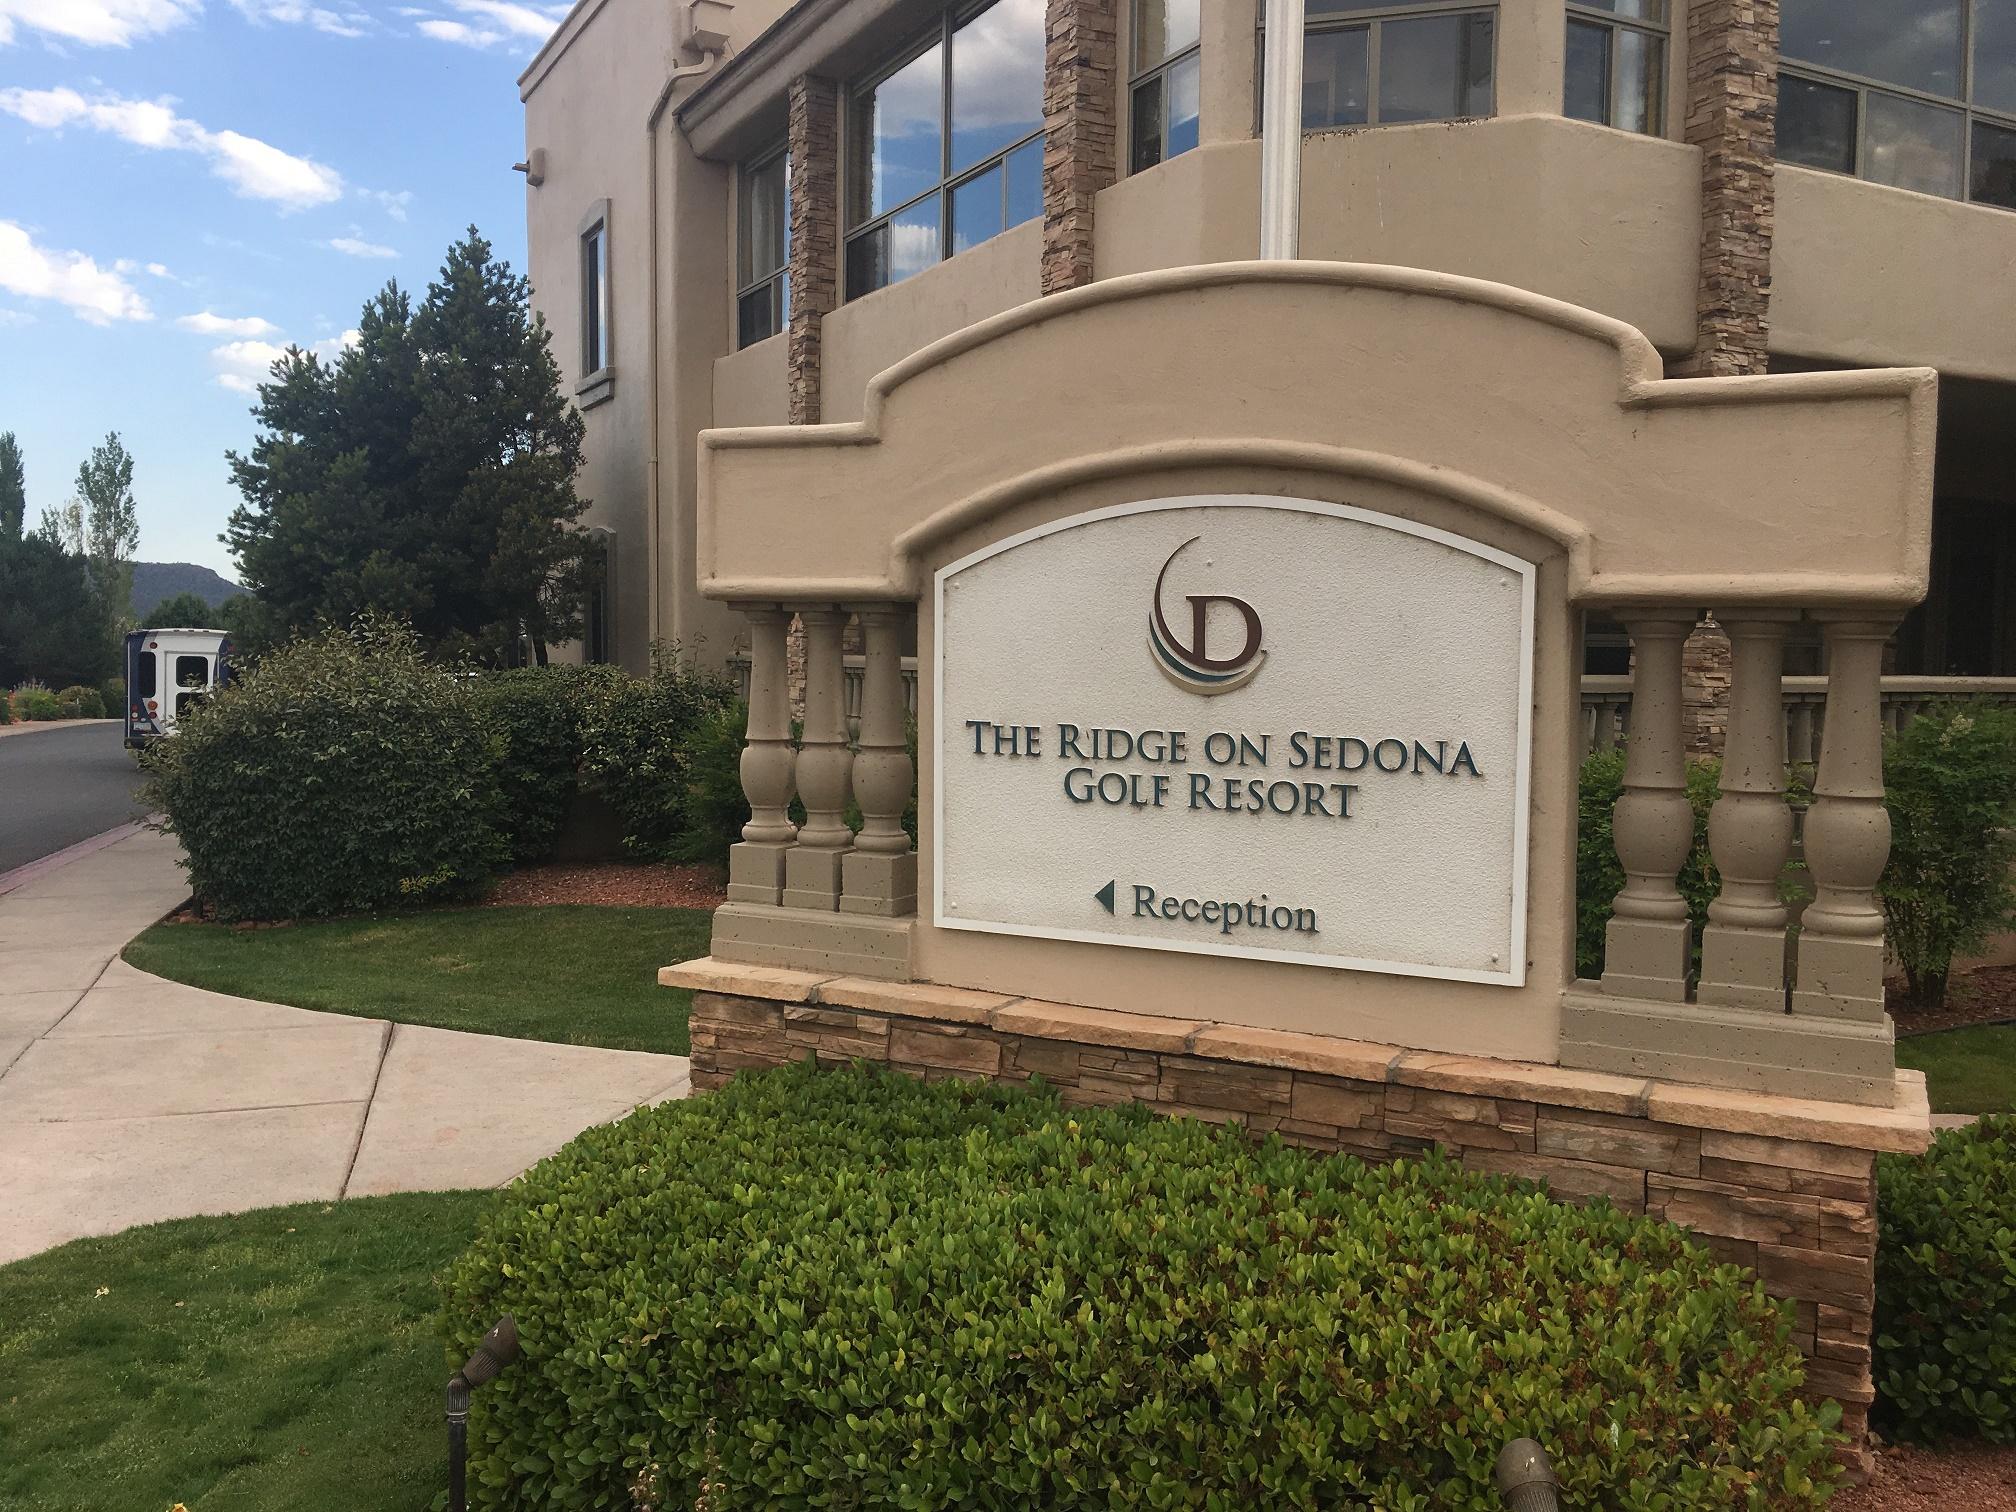 The Ridge On Sedona Golf Resort | セドナのゴルフ場に併設のホテルは、ハンパない流れ星に願いを託したい場所